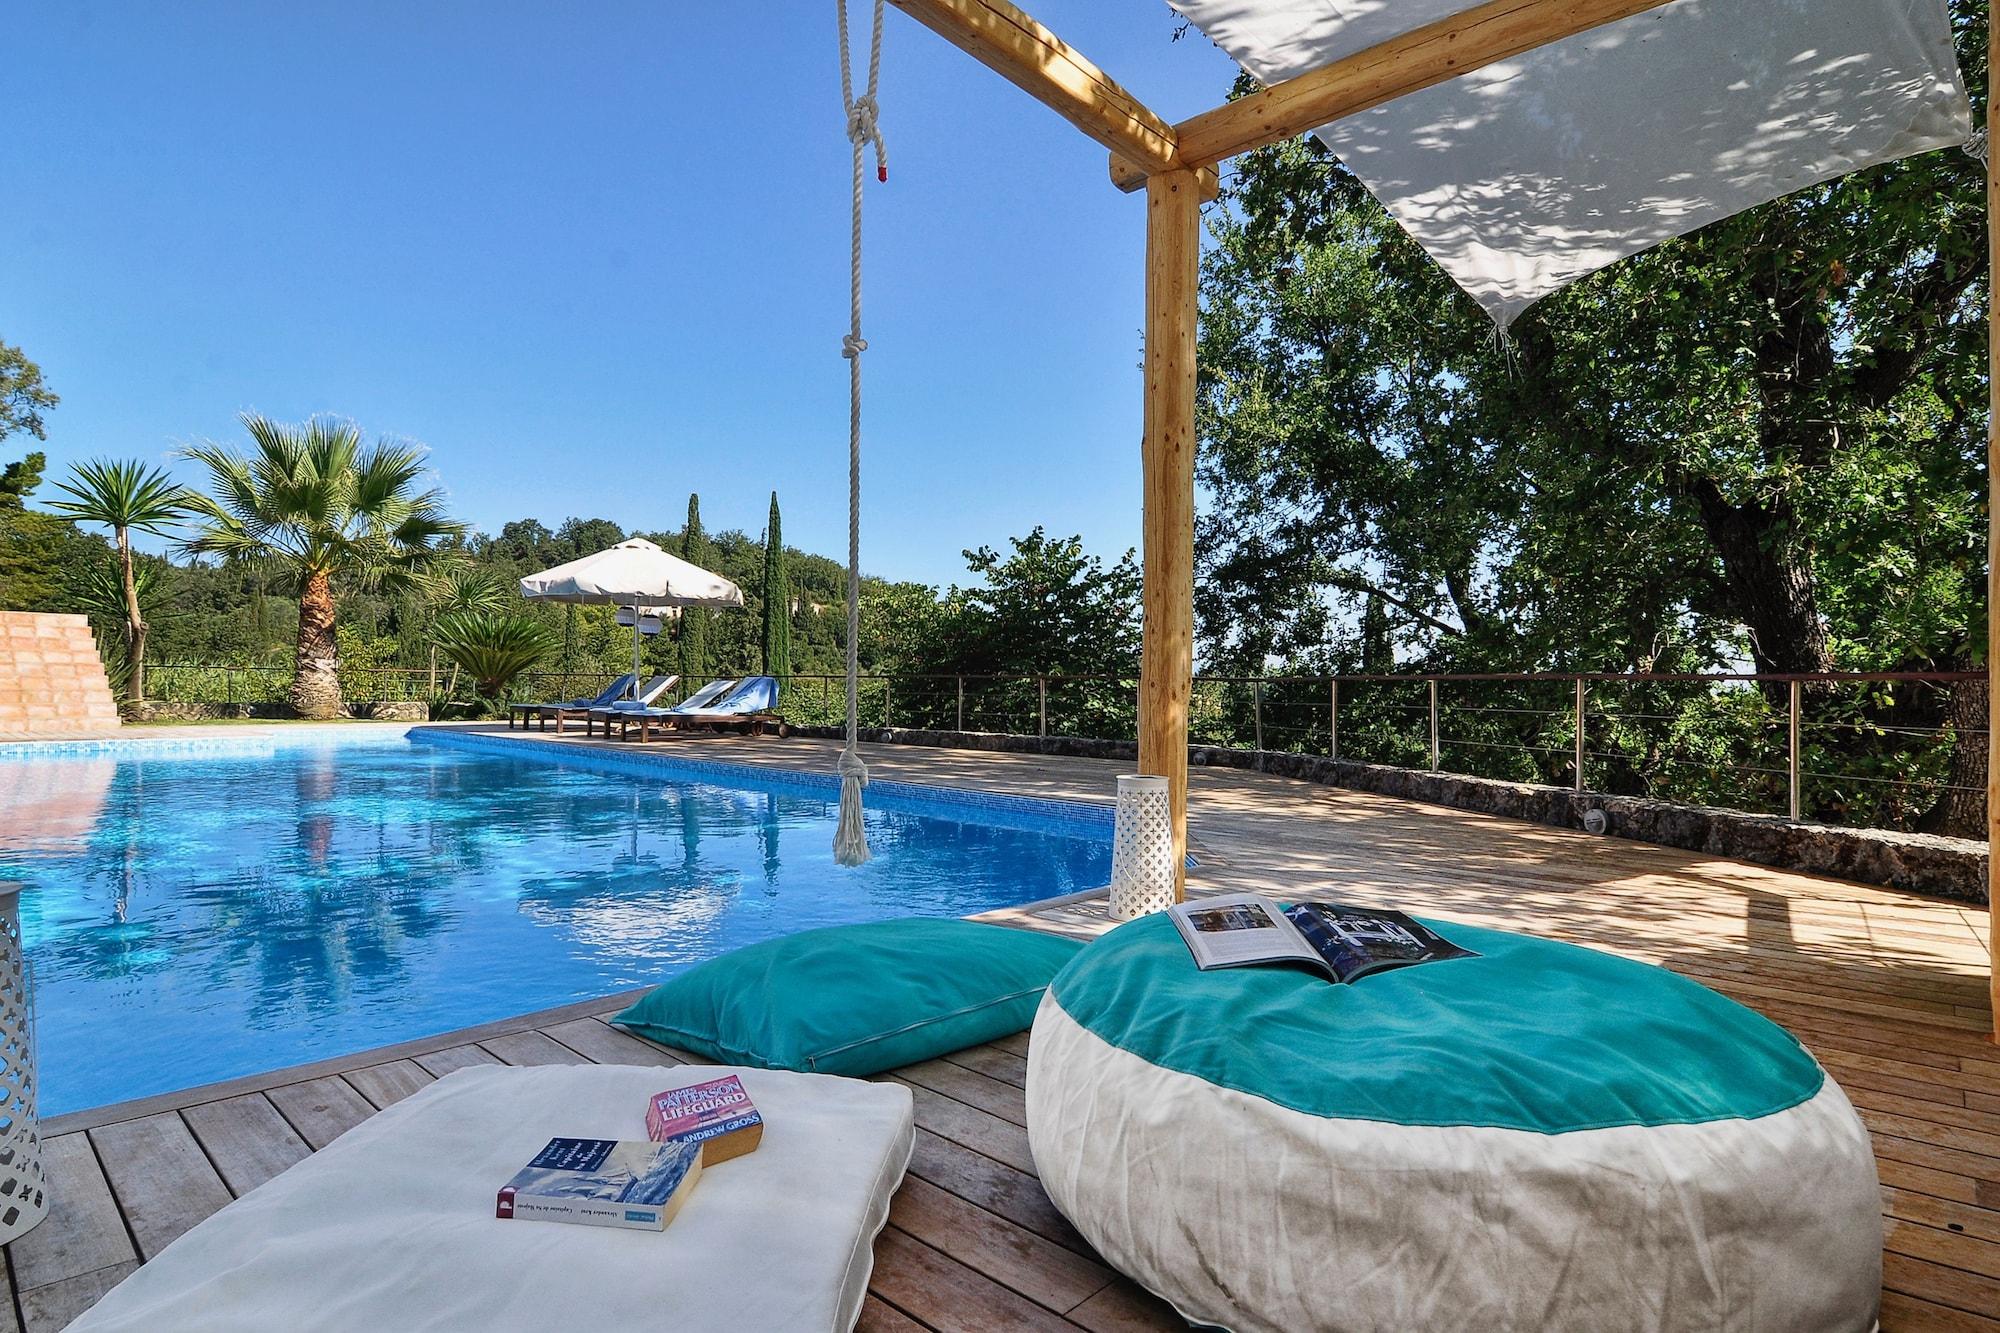 Villa Chloe in Corfu, Ionian Islands